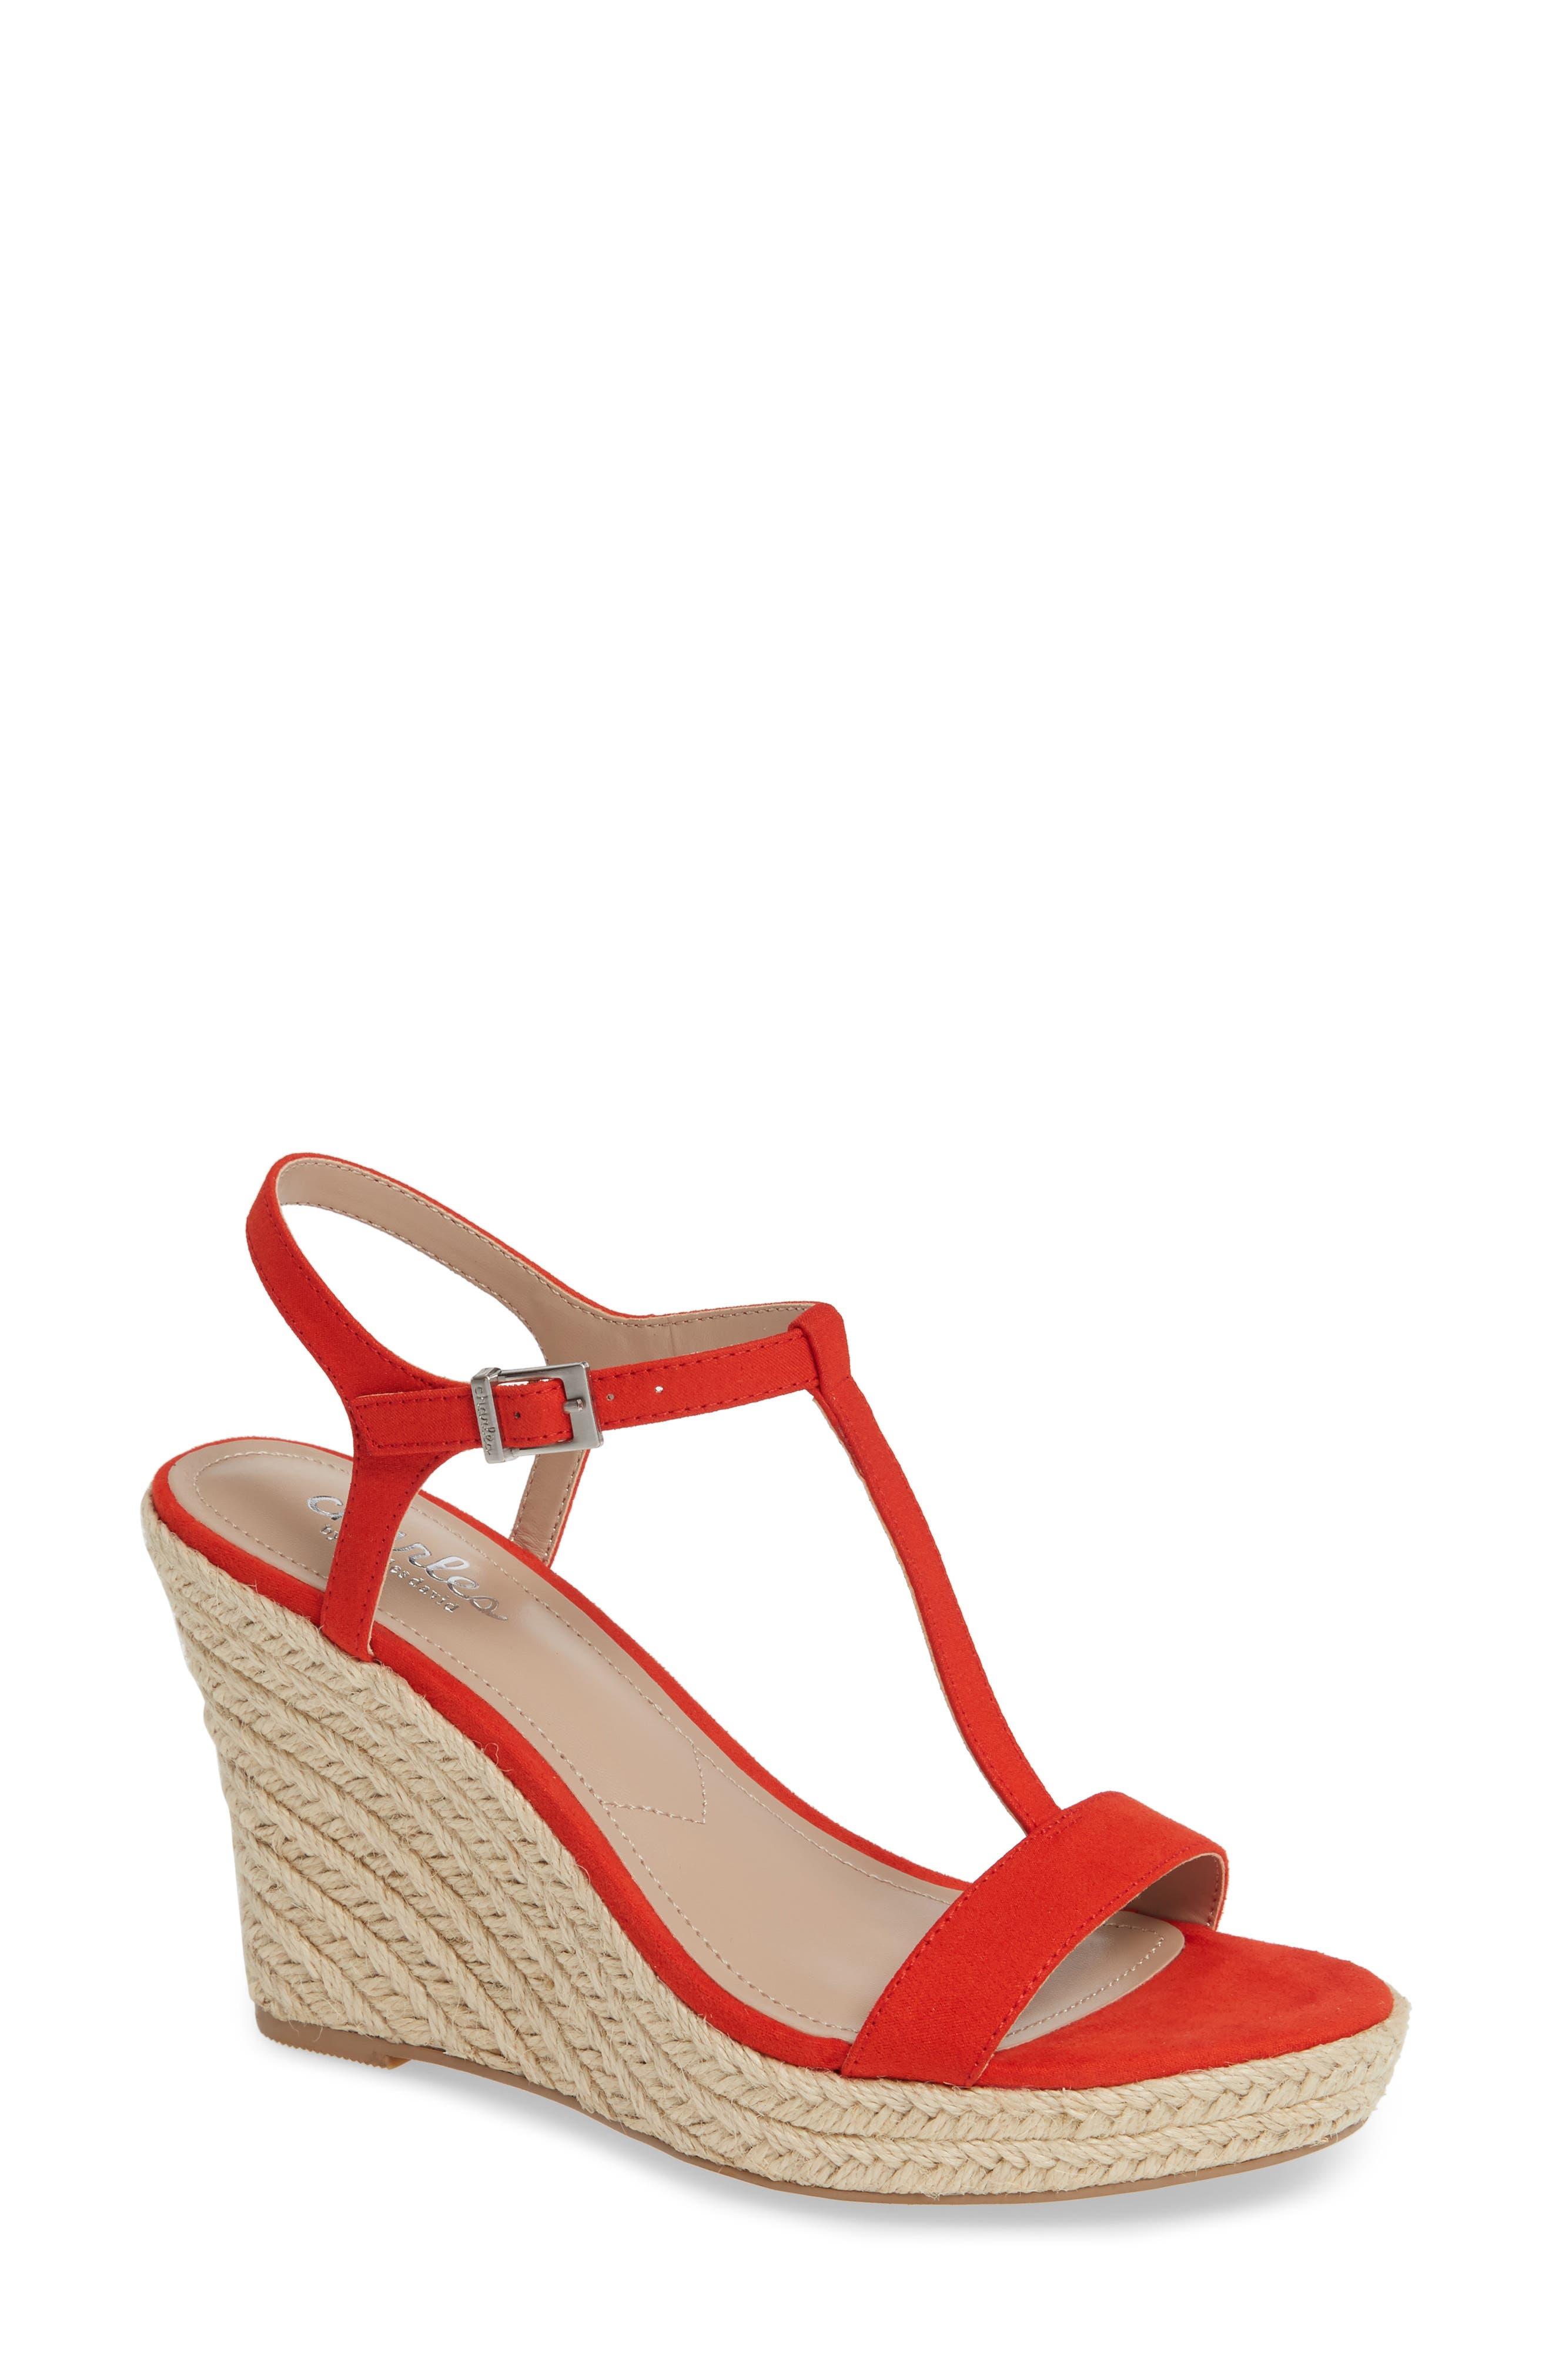 Charles By Charles David Lili T-Strap Wedge Sandal- Red